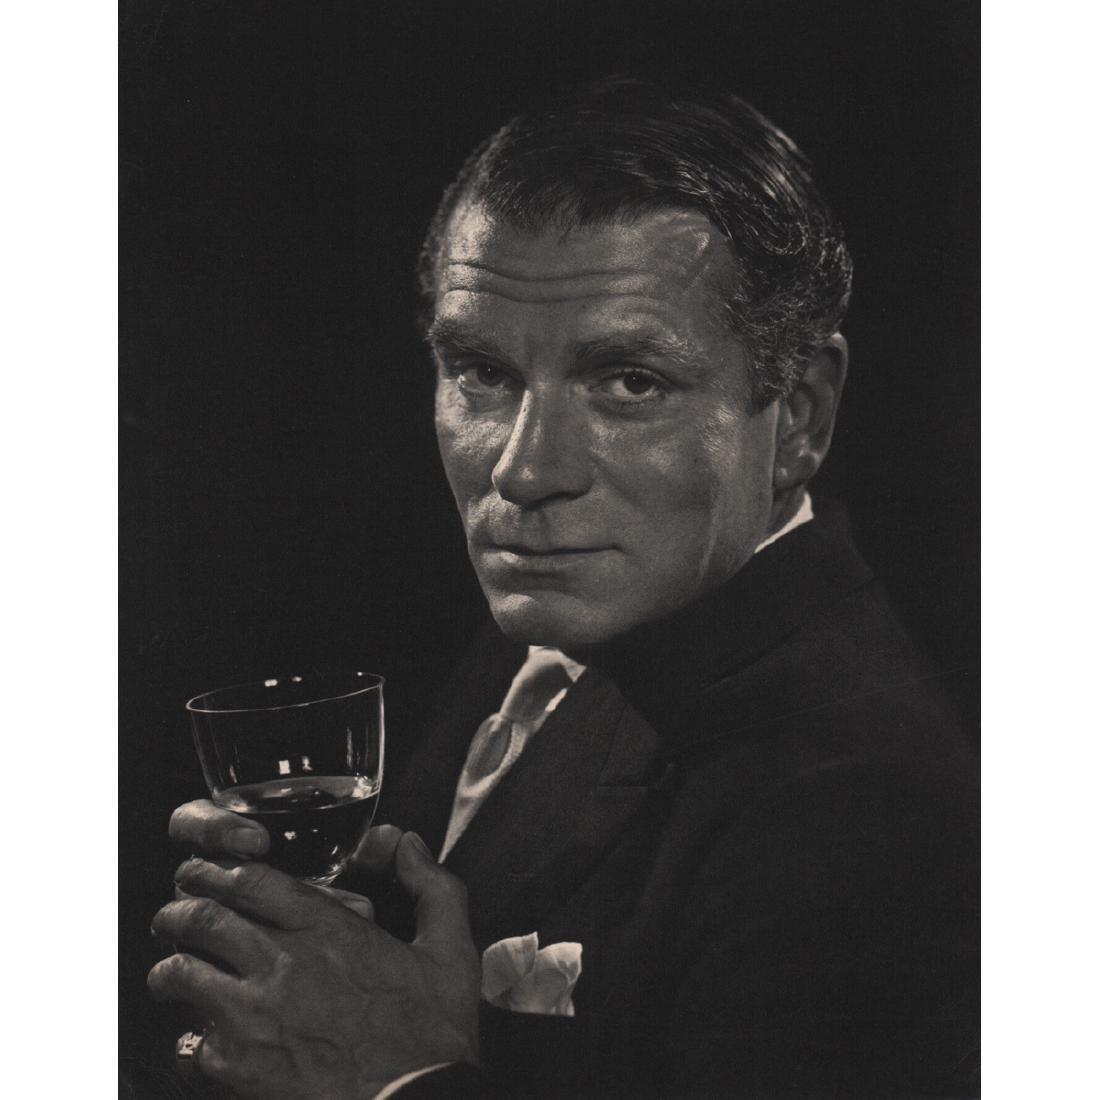 YOUSUF KARSH - Sir Laurence Olivier